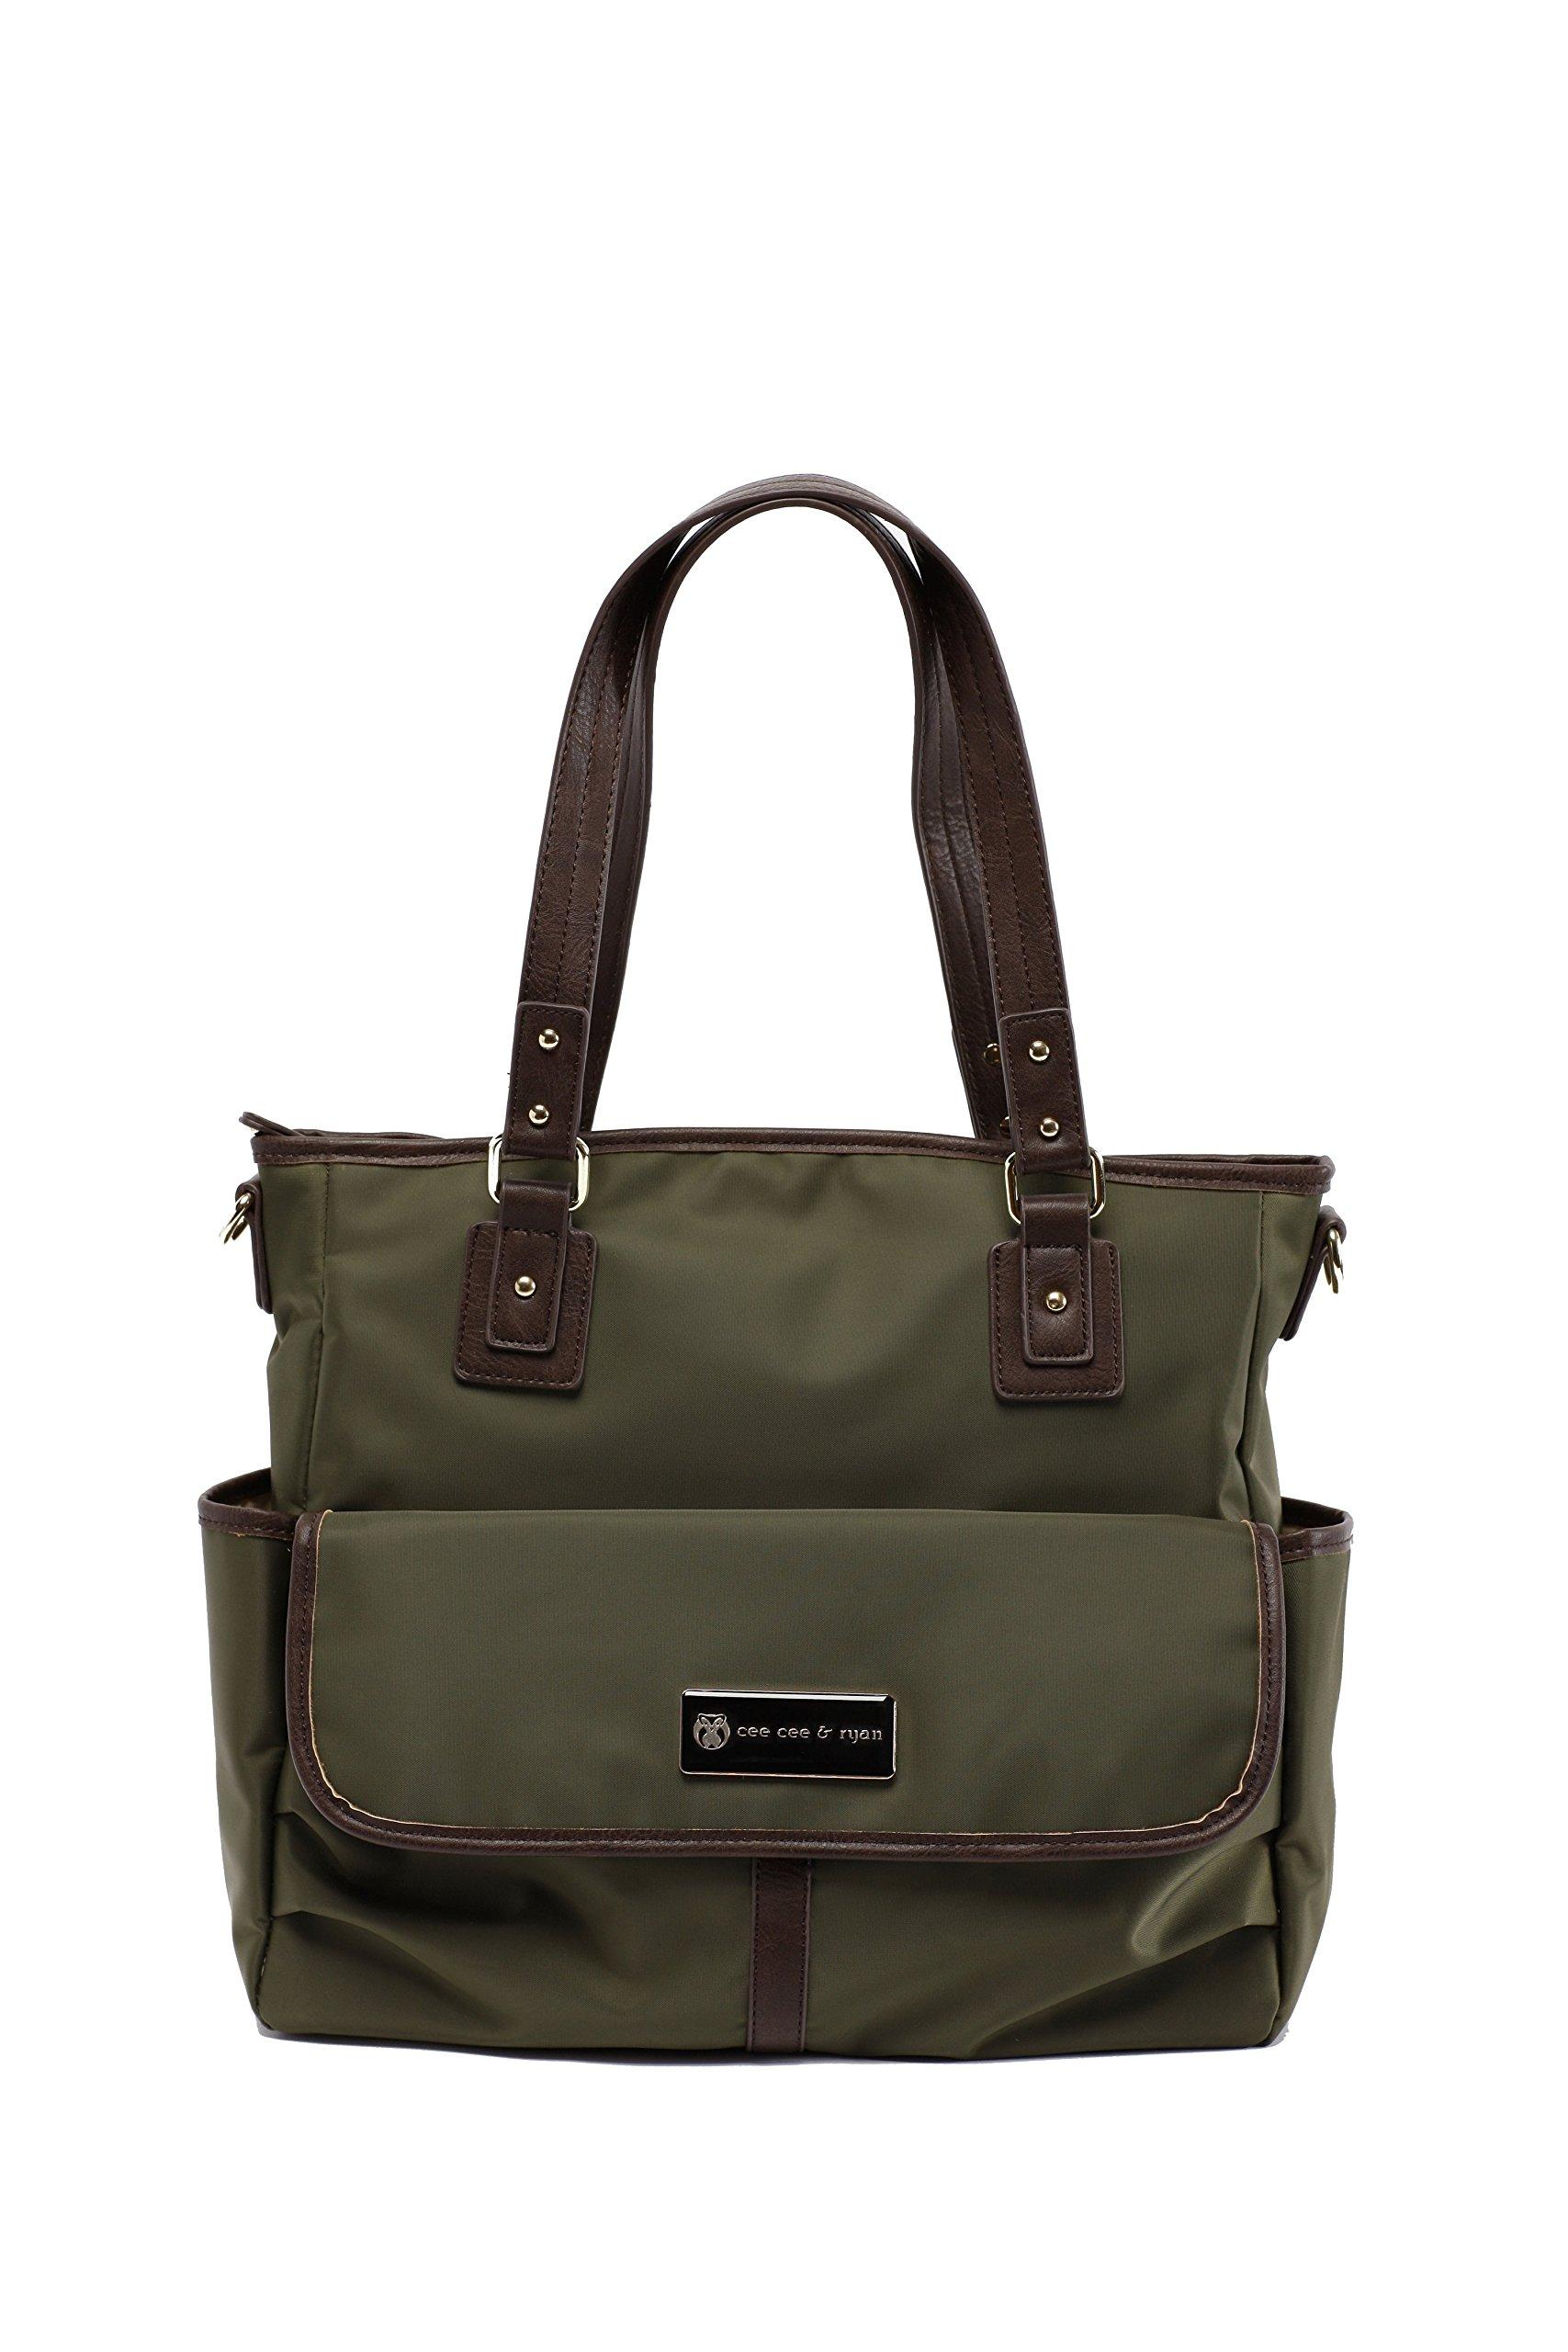 CEE CEE & Ryan 'Lisa' Baby bag/borsa fasciatoio–Carryall Tote, olive